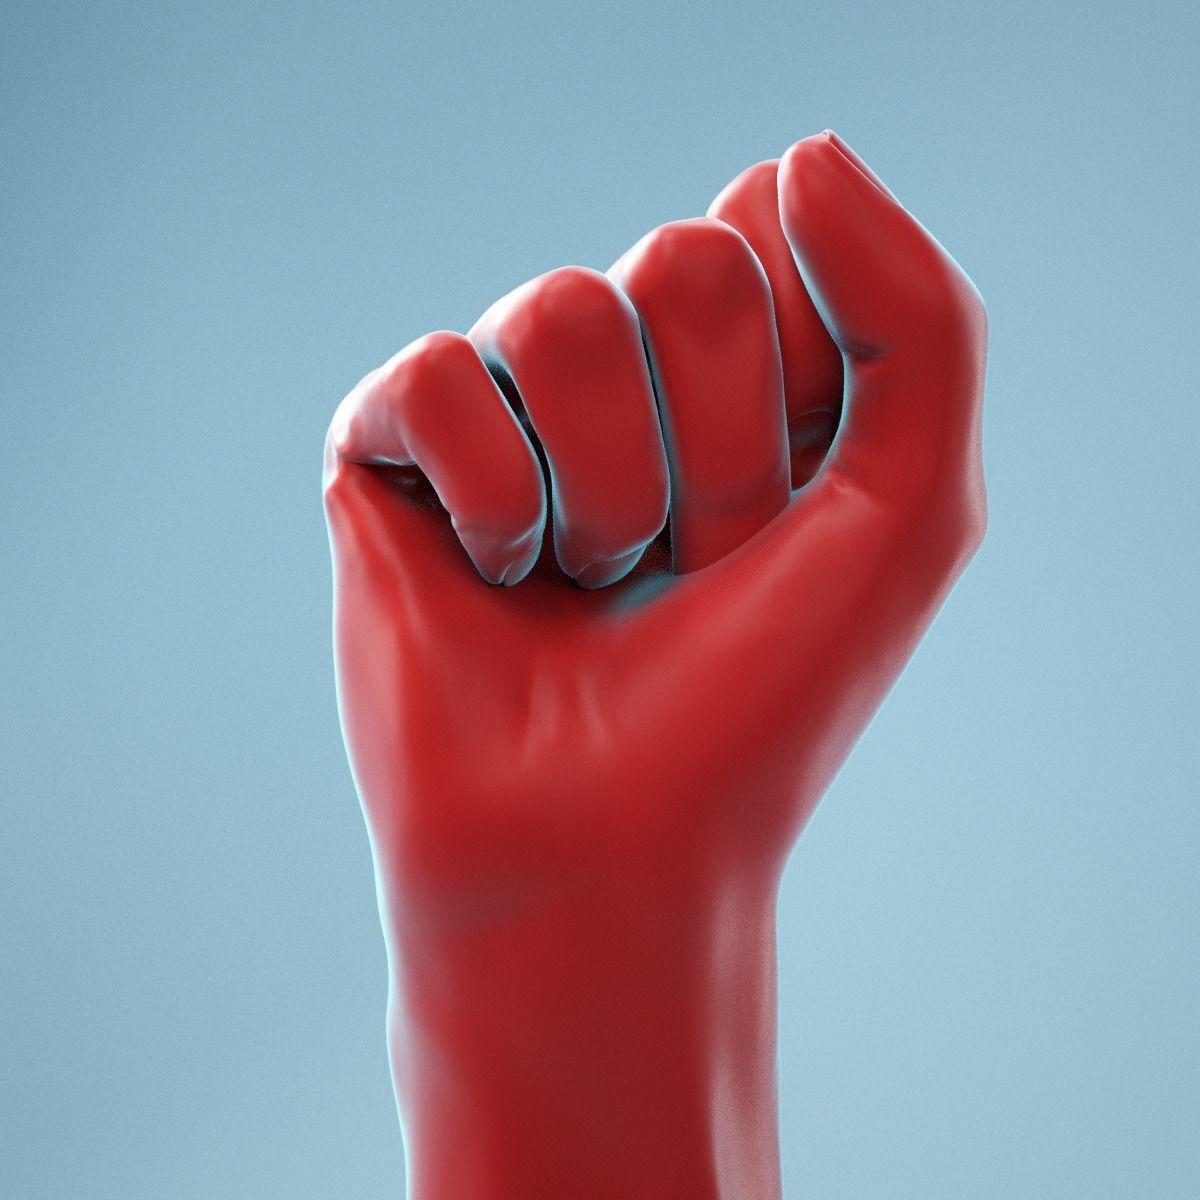 Fist Realistic Hand Model 03